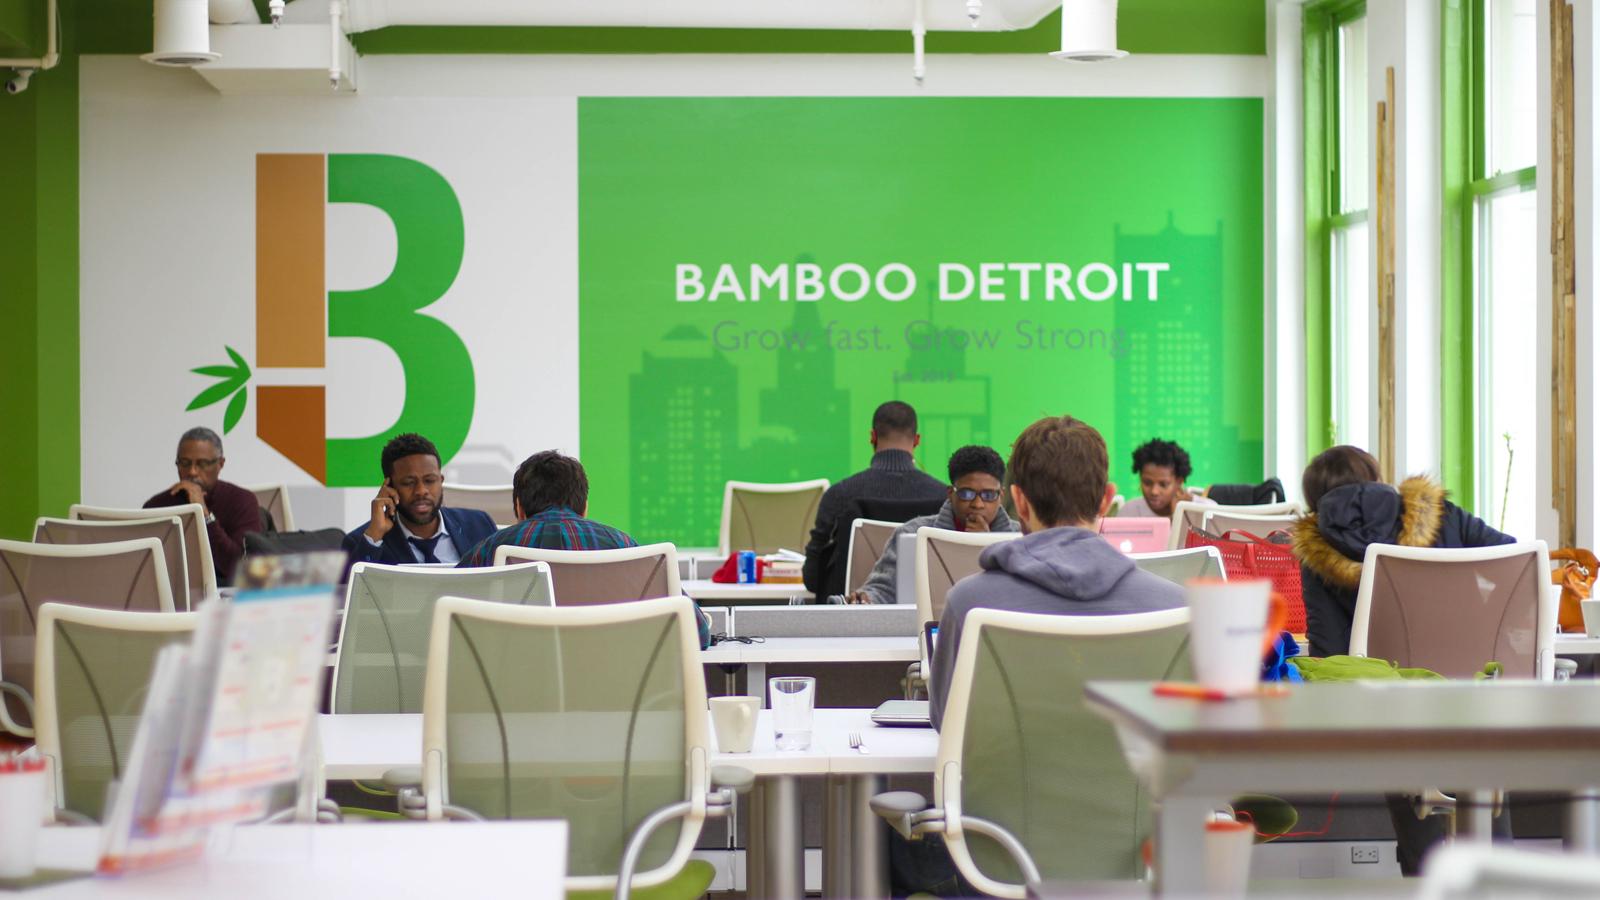 Bamboo_detroit_modern_industrial_office_design.1.jpg